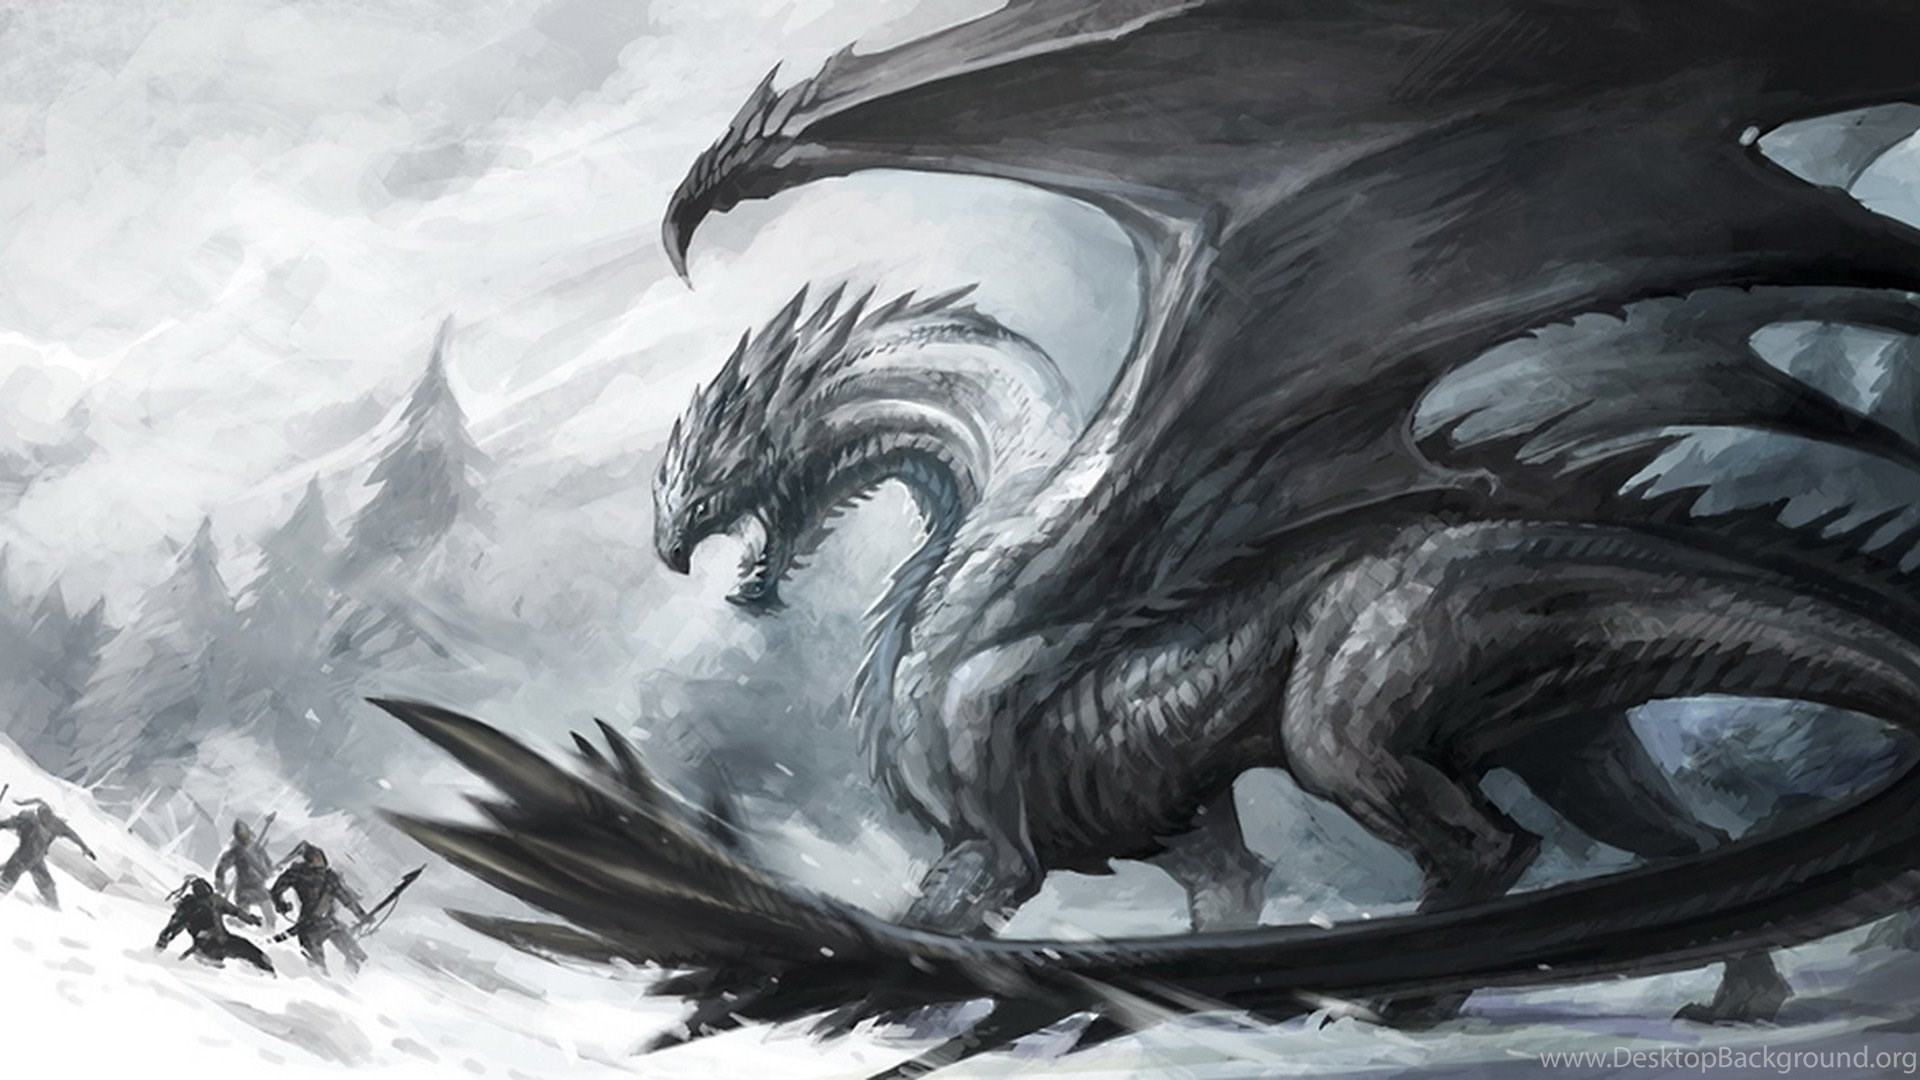 High Resolution Fantasy Black Dragon Wallpapers Hd White Dragon 1920x1080 Download Hd Wallpaper Wallpapertip